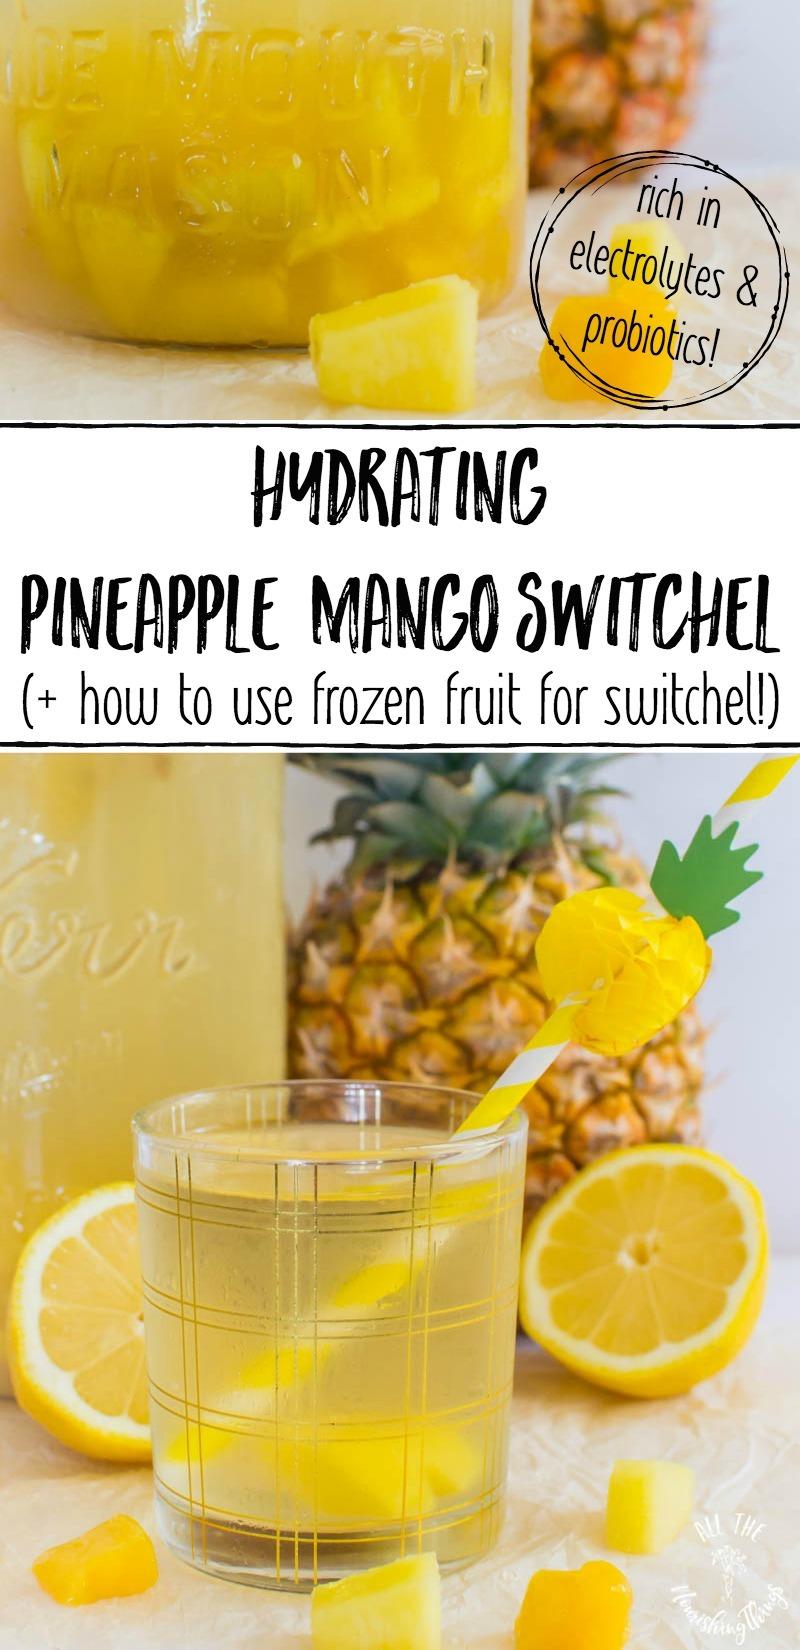 pineapple mango switchel with text overlay